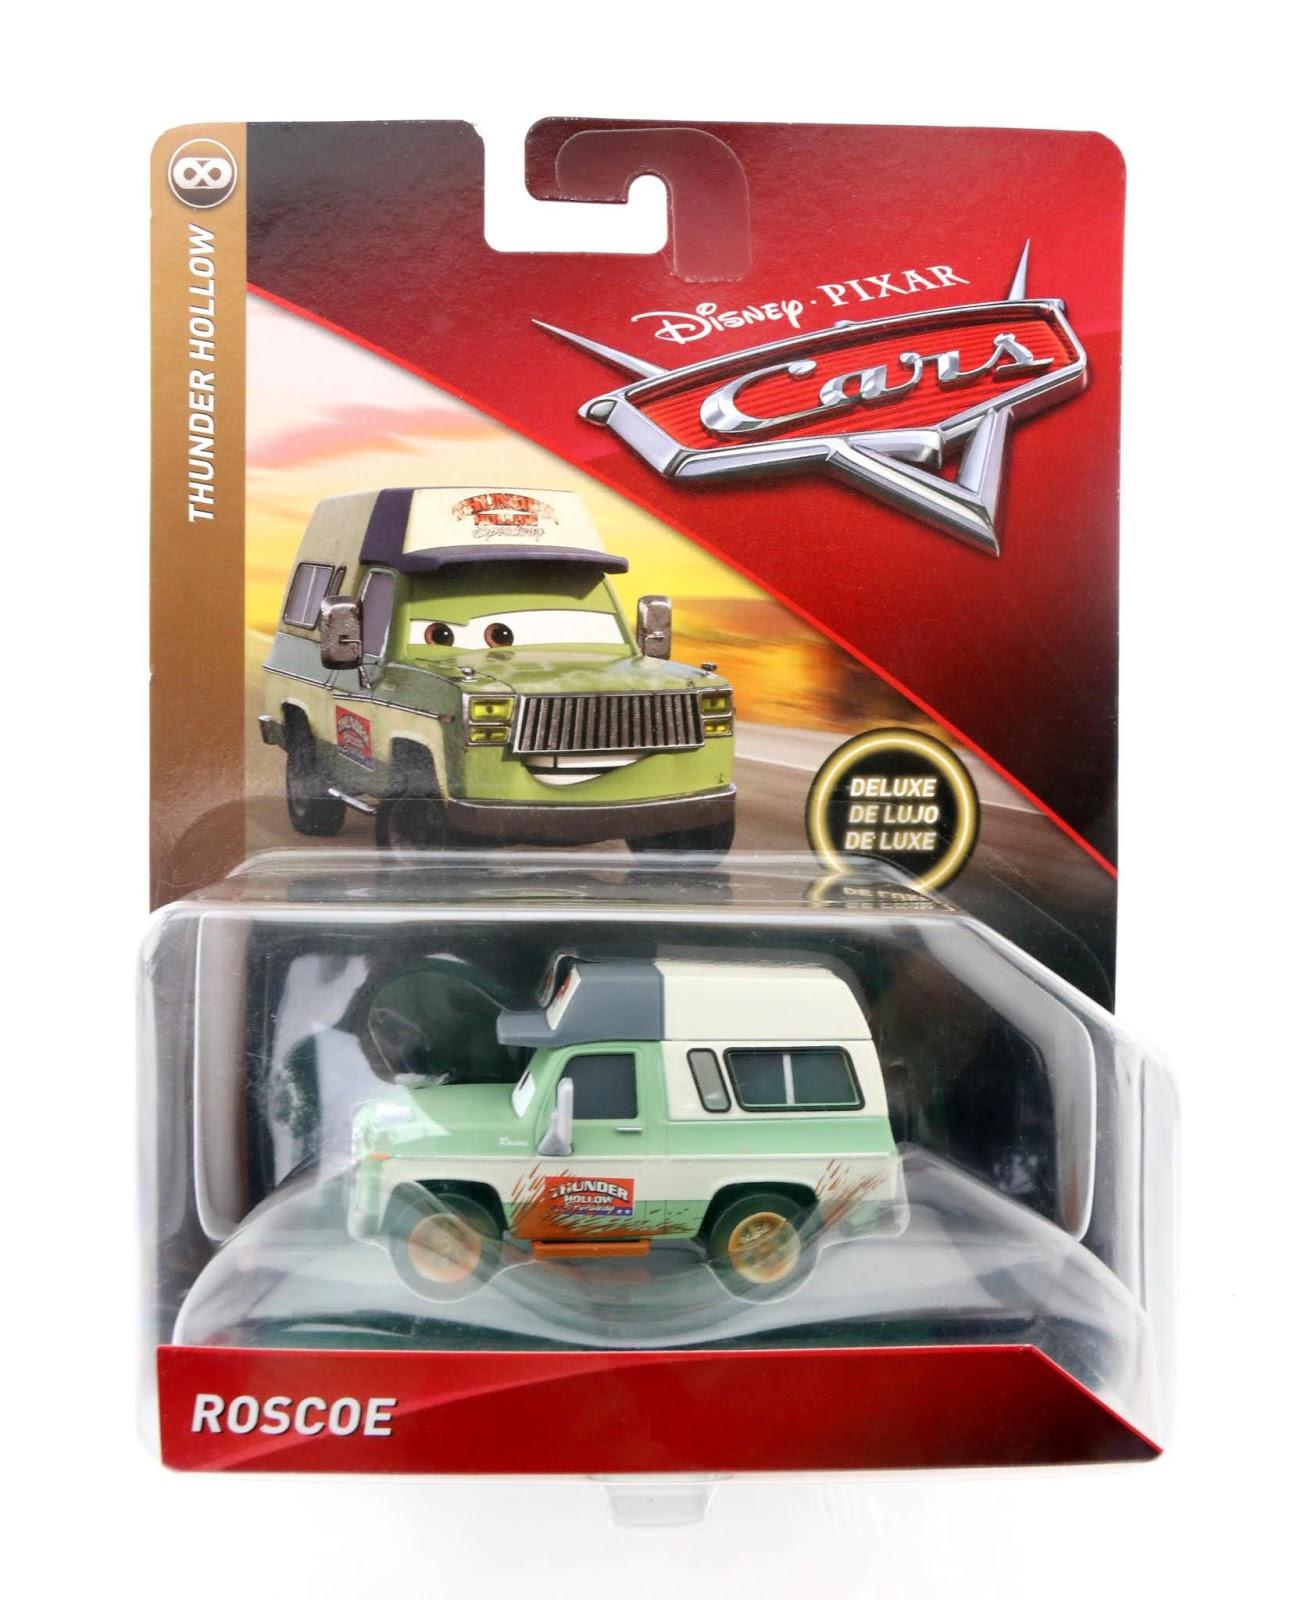 Cars 3 Mattel Roscoe Deluxe diecast